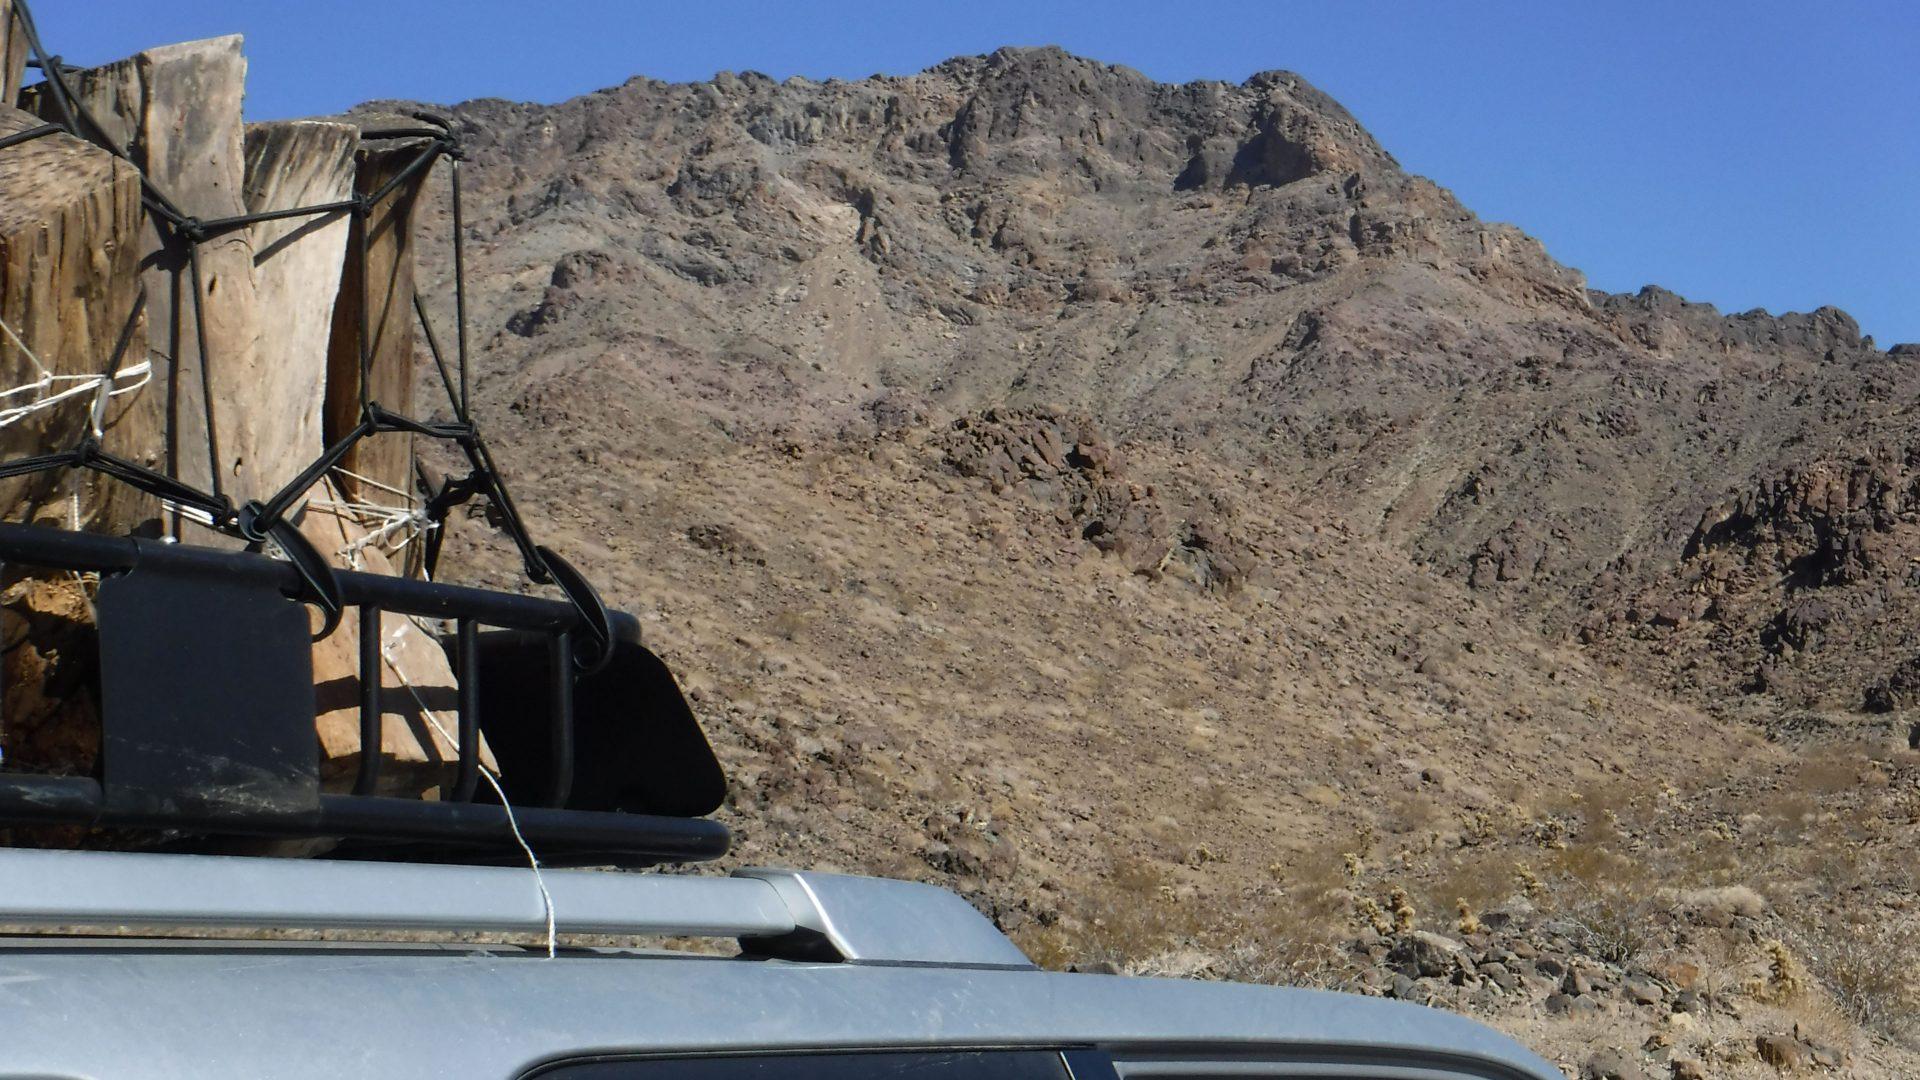 View of a desert peak from below